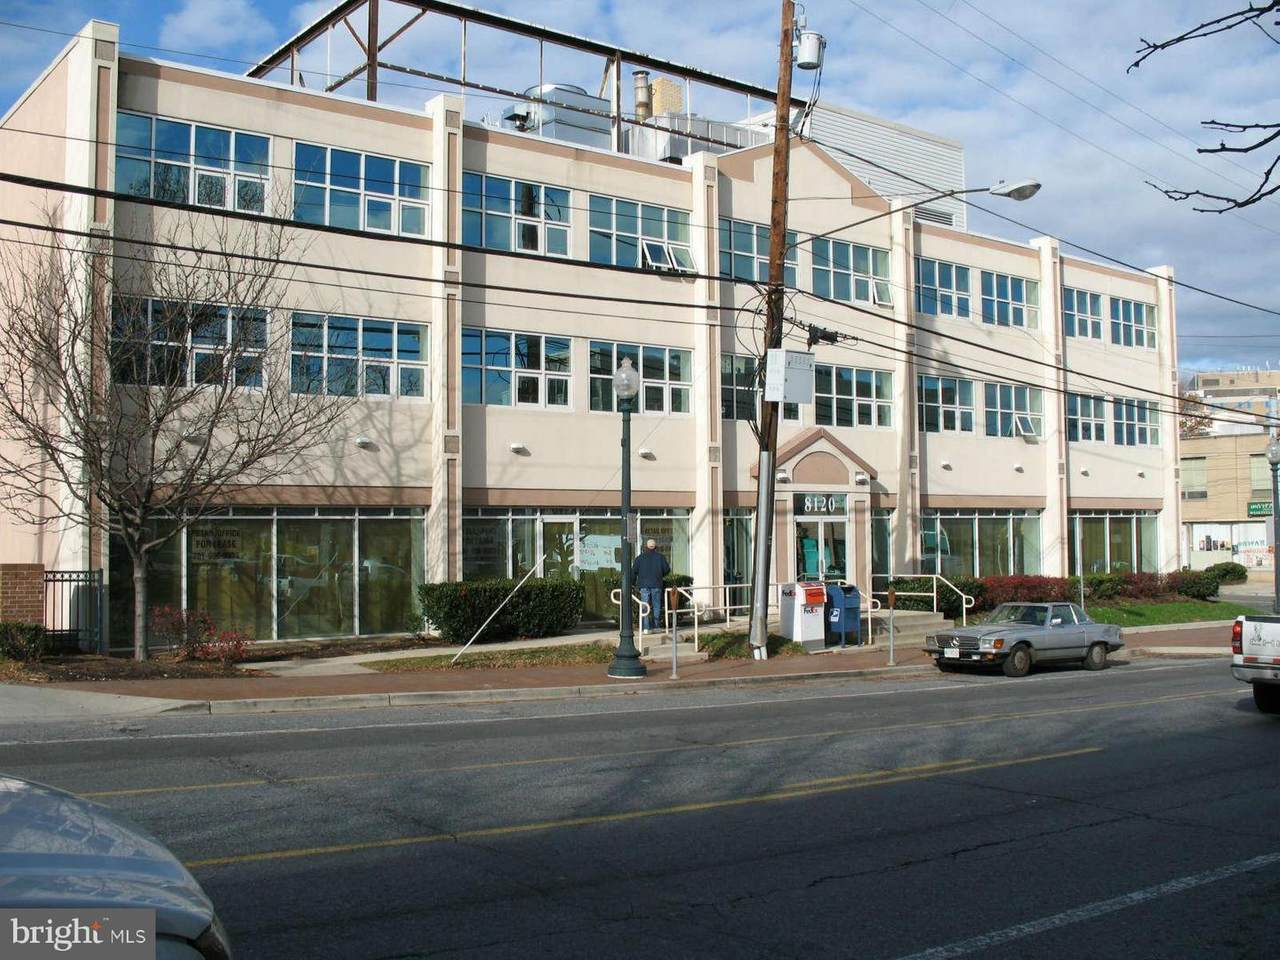 8120 Fenton Street - Photo 1